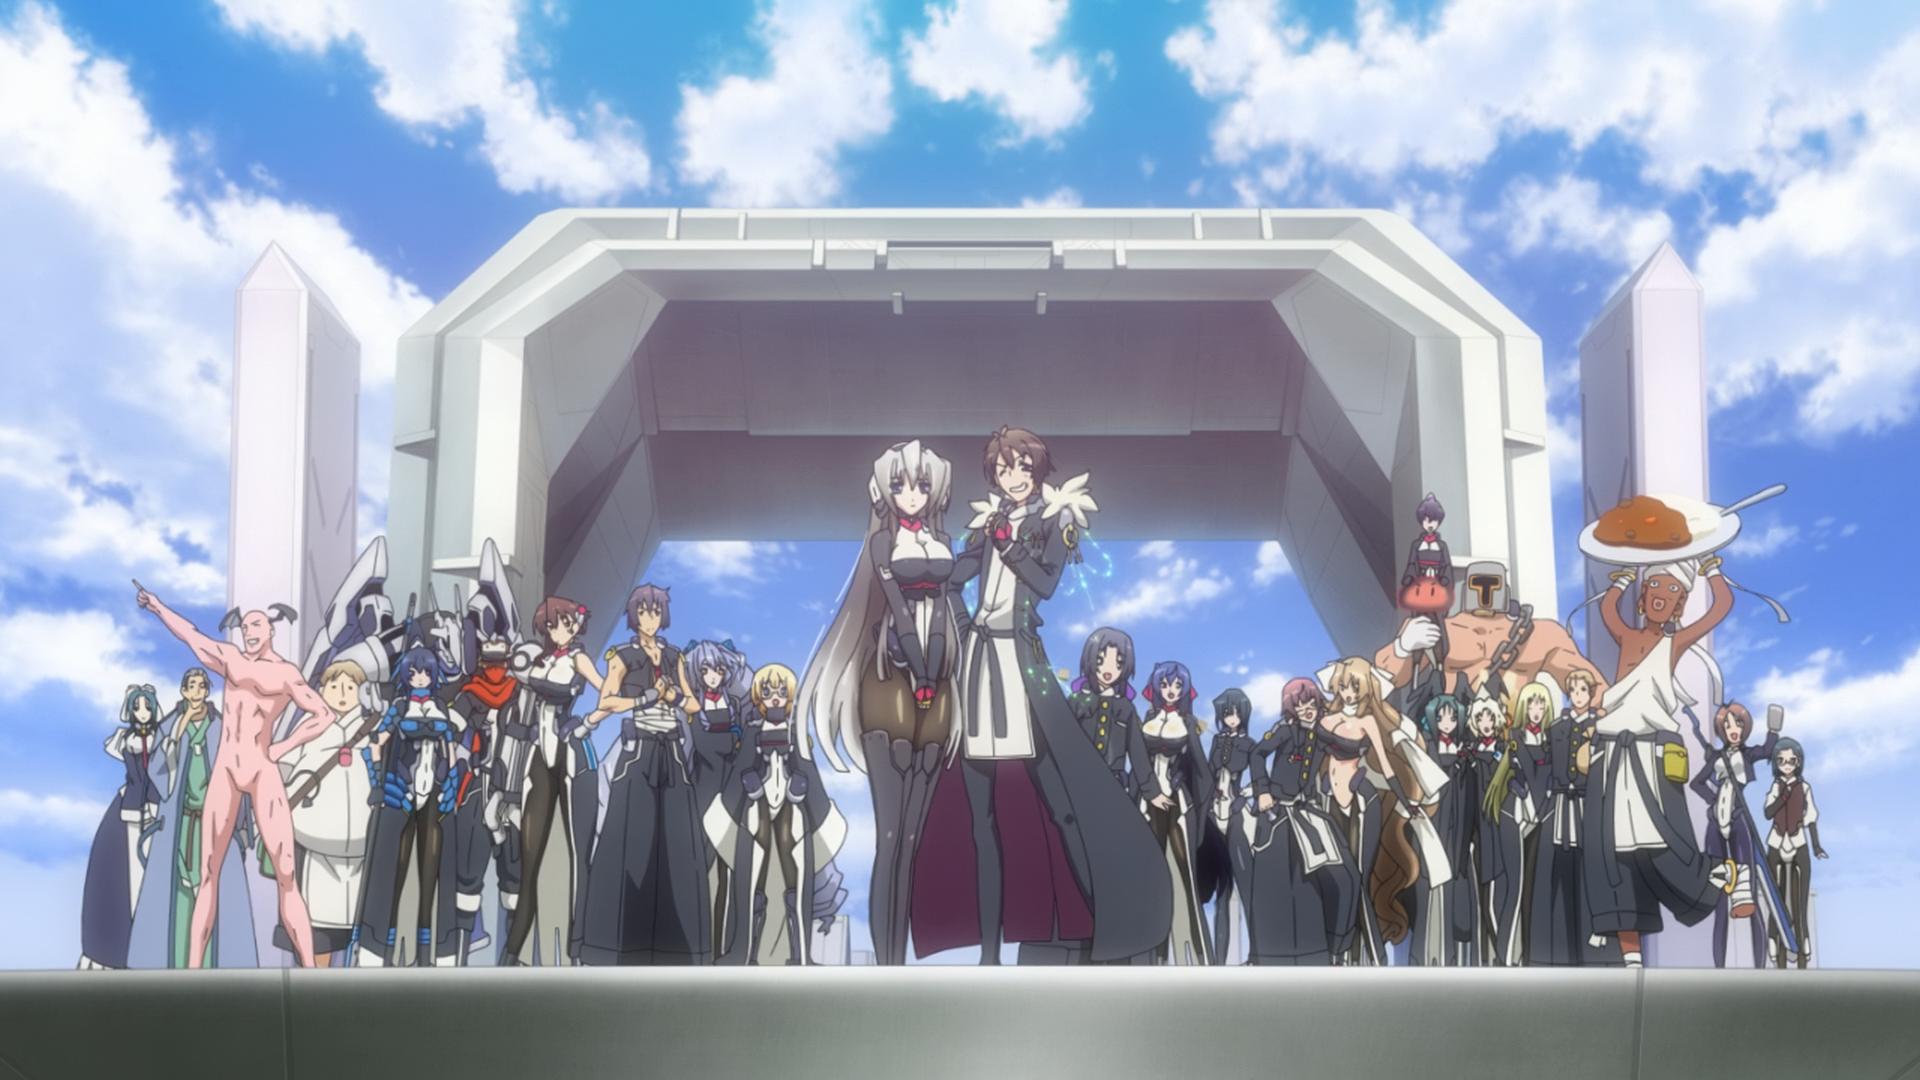 Kyoukai Senjou no Horizon II ตอนที่ 1-13 ซับไทย